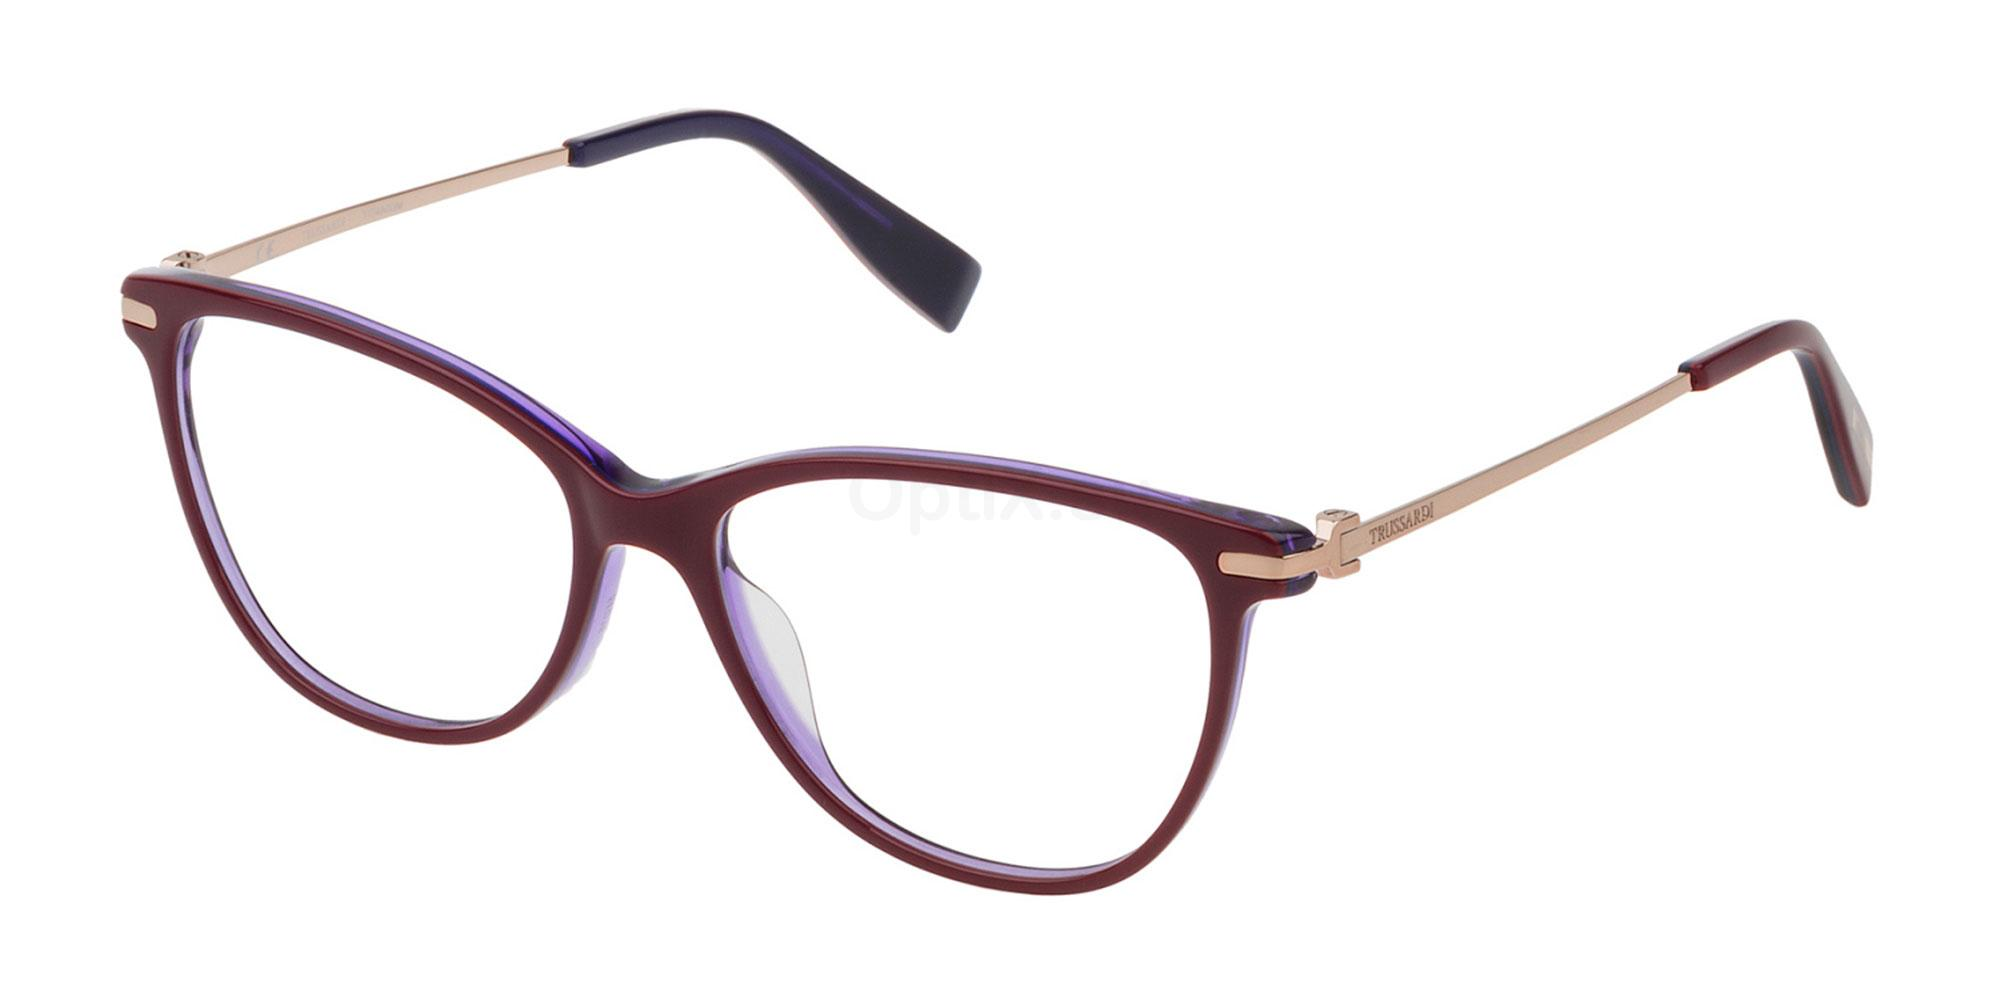 01CI VTR241 Glasses, Trussardi